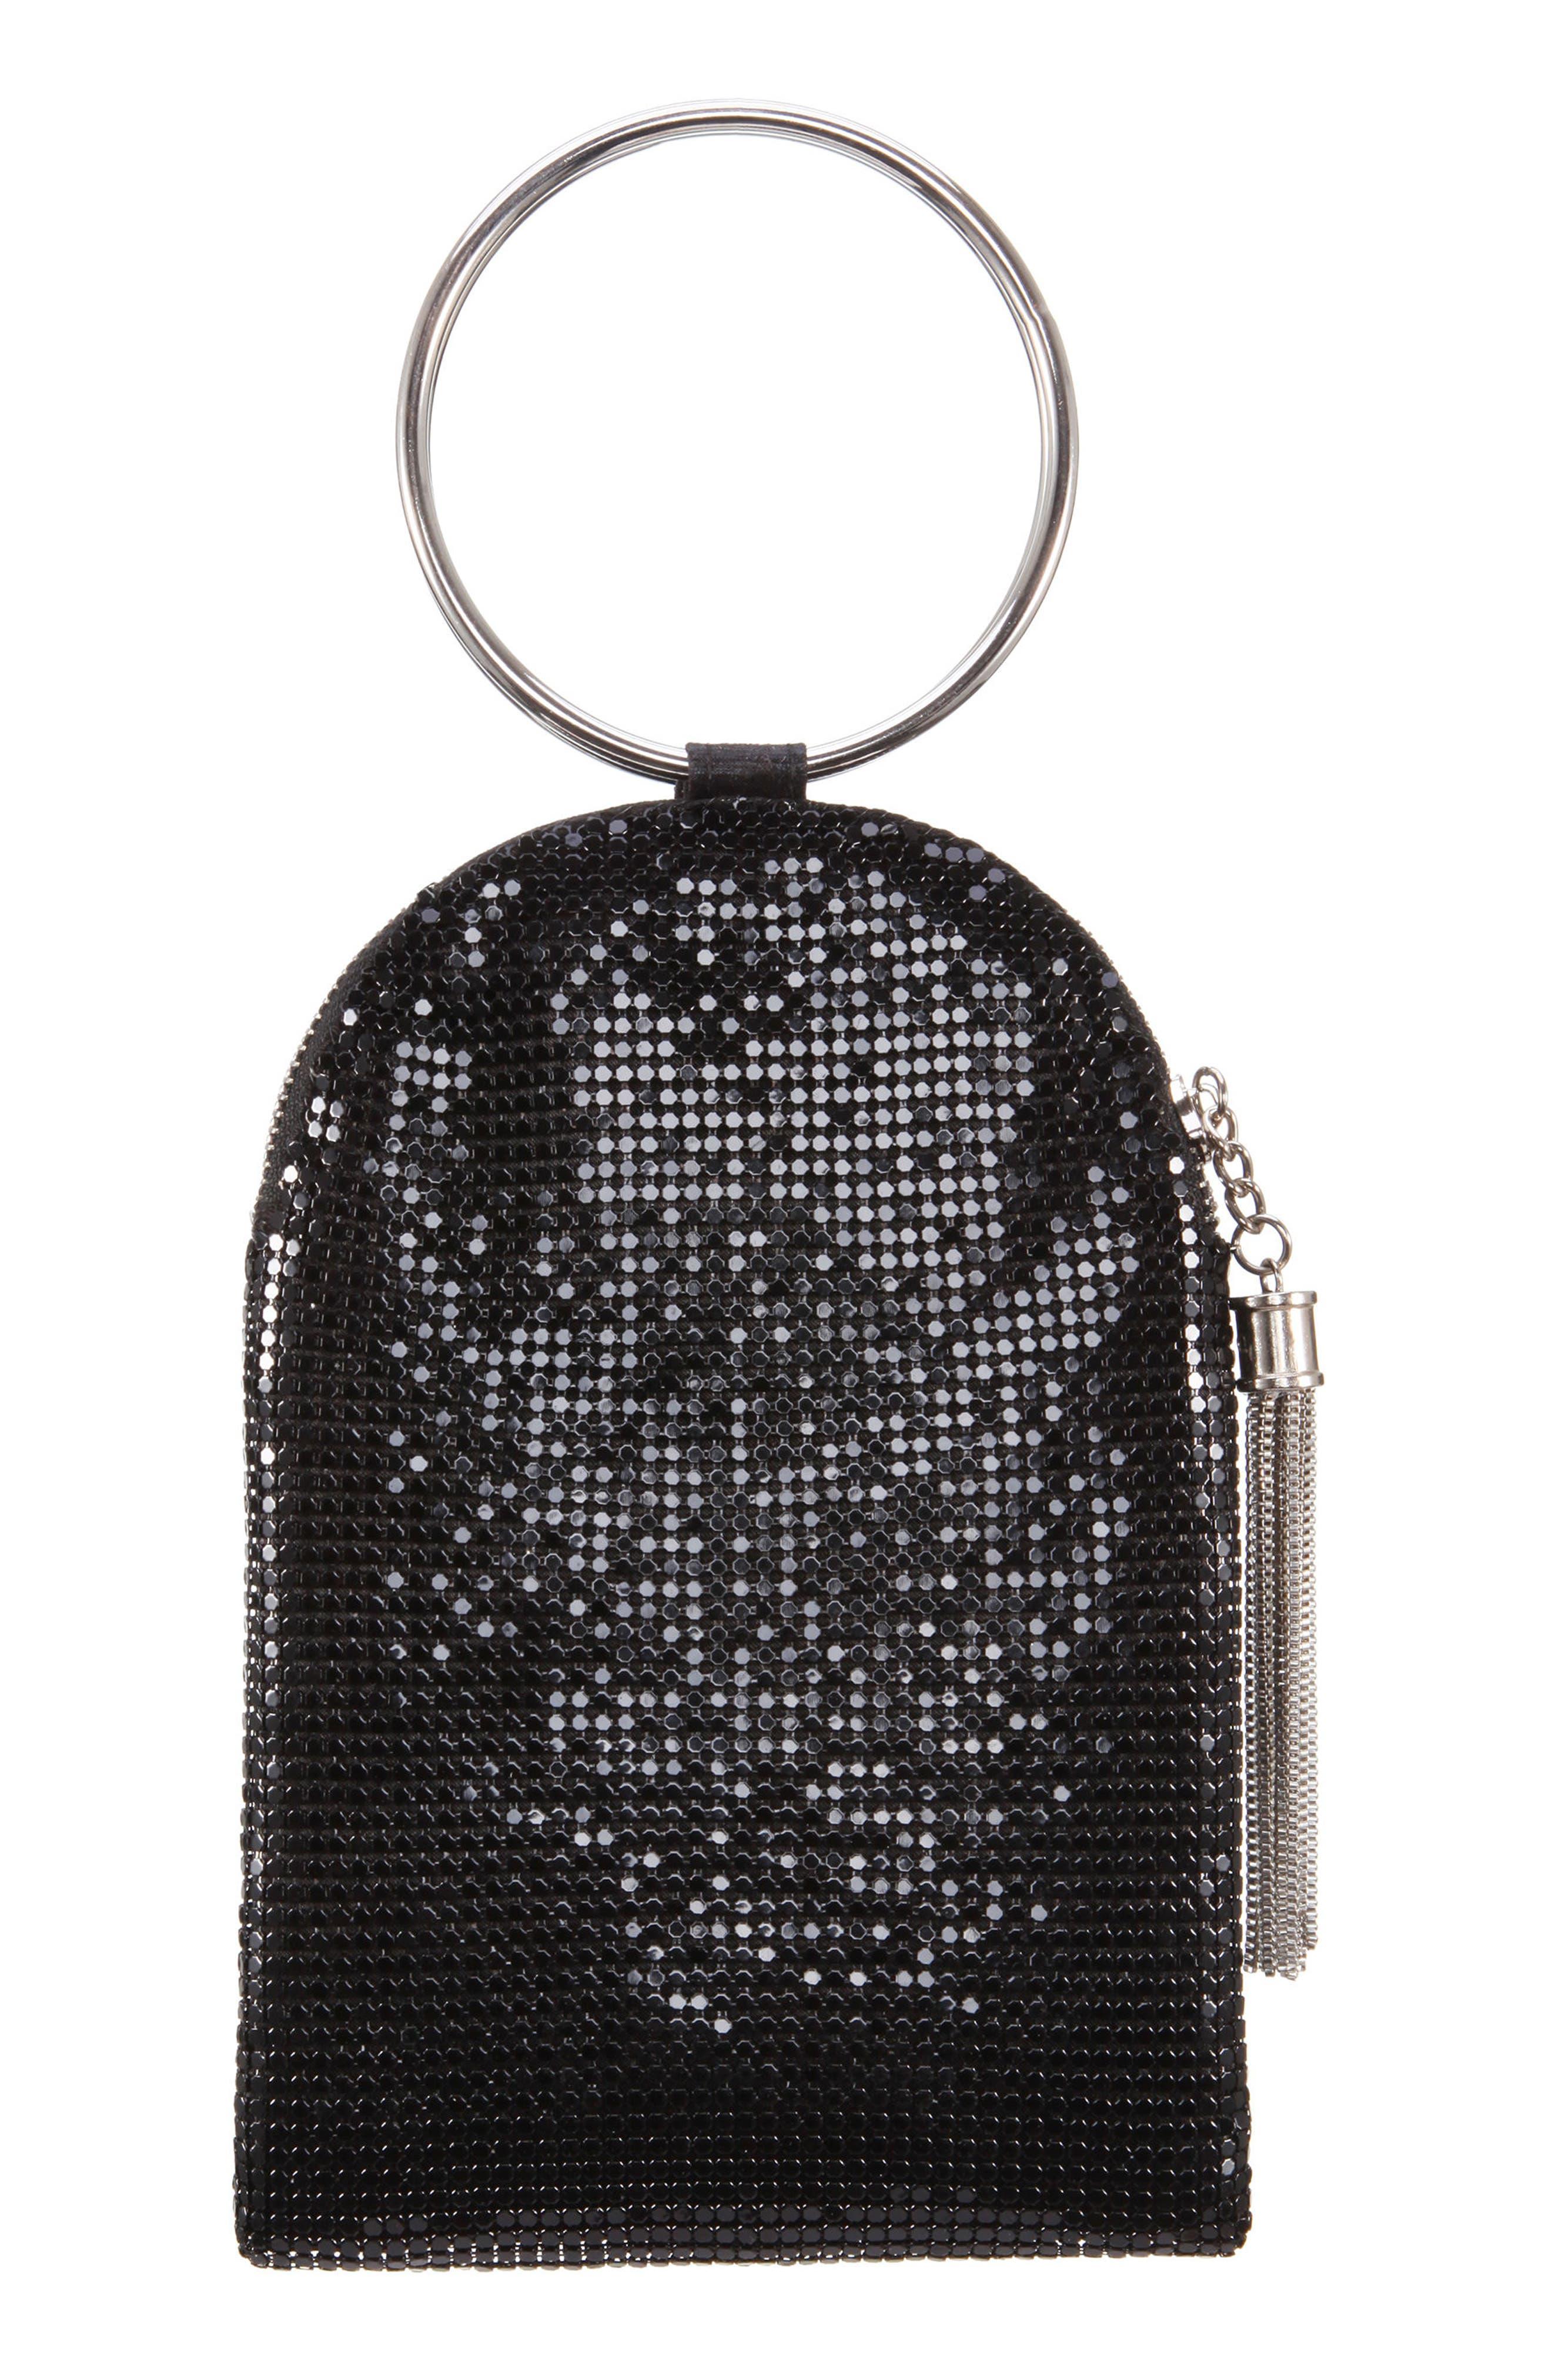 NINA, Metallic Mesh Handbag, Main thumbnail 1, color, BLACK